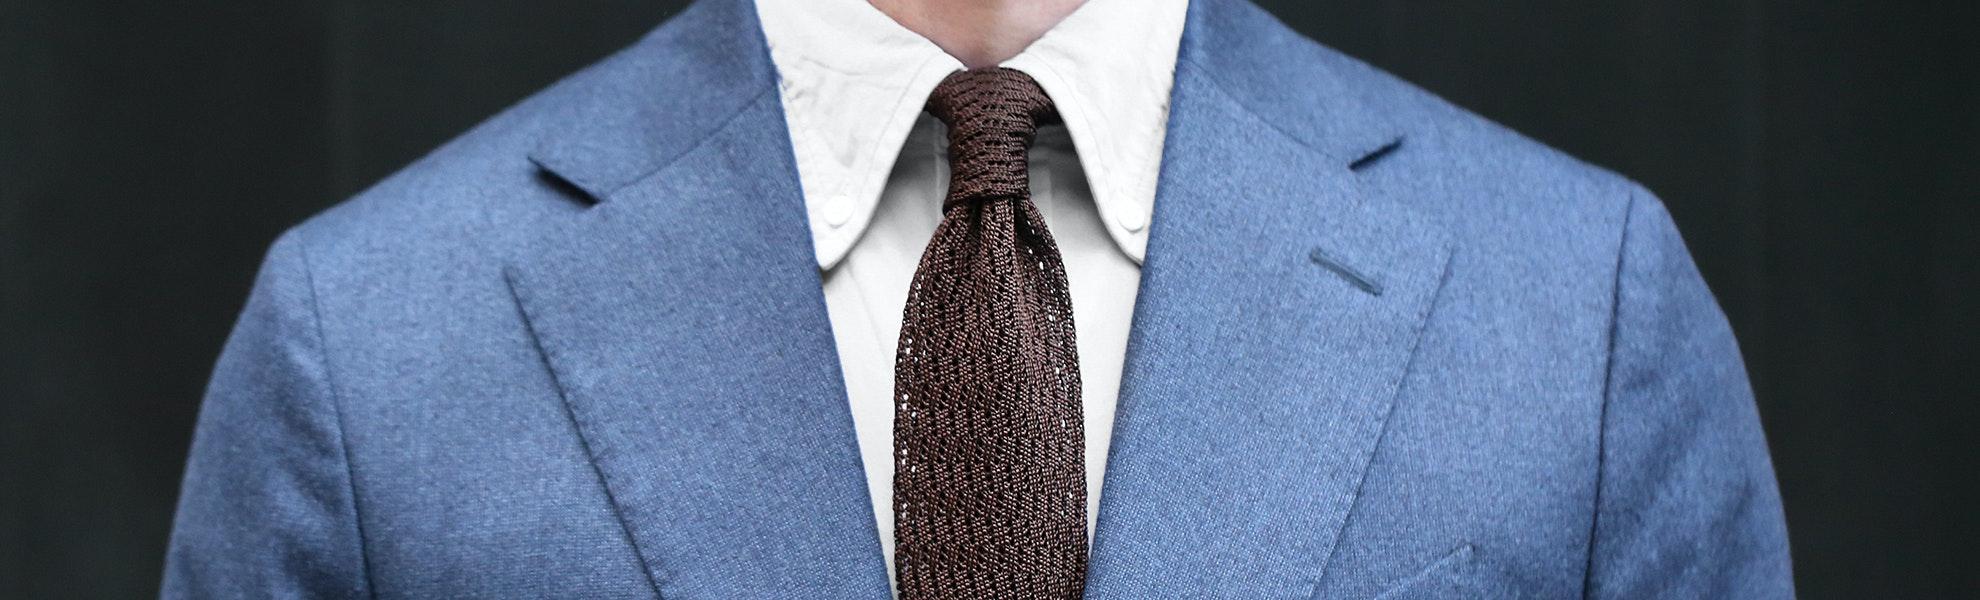 Knottery New York Zigzag Knit Ties